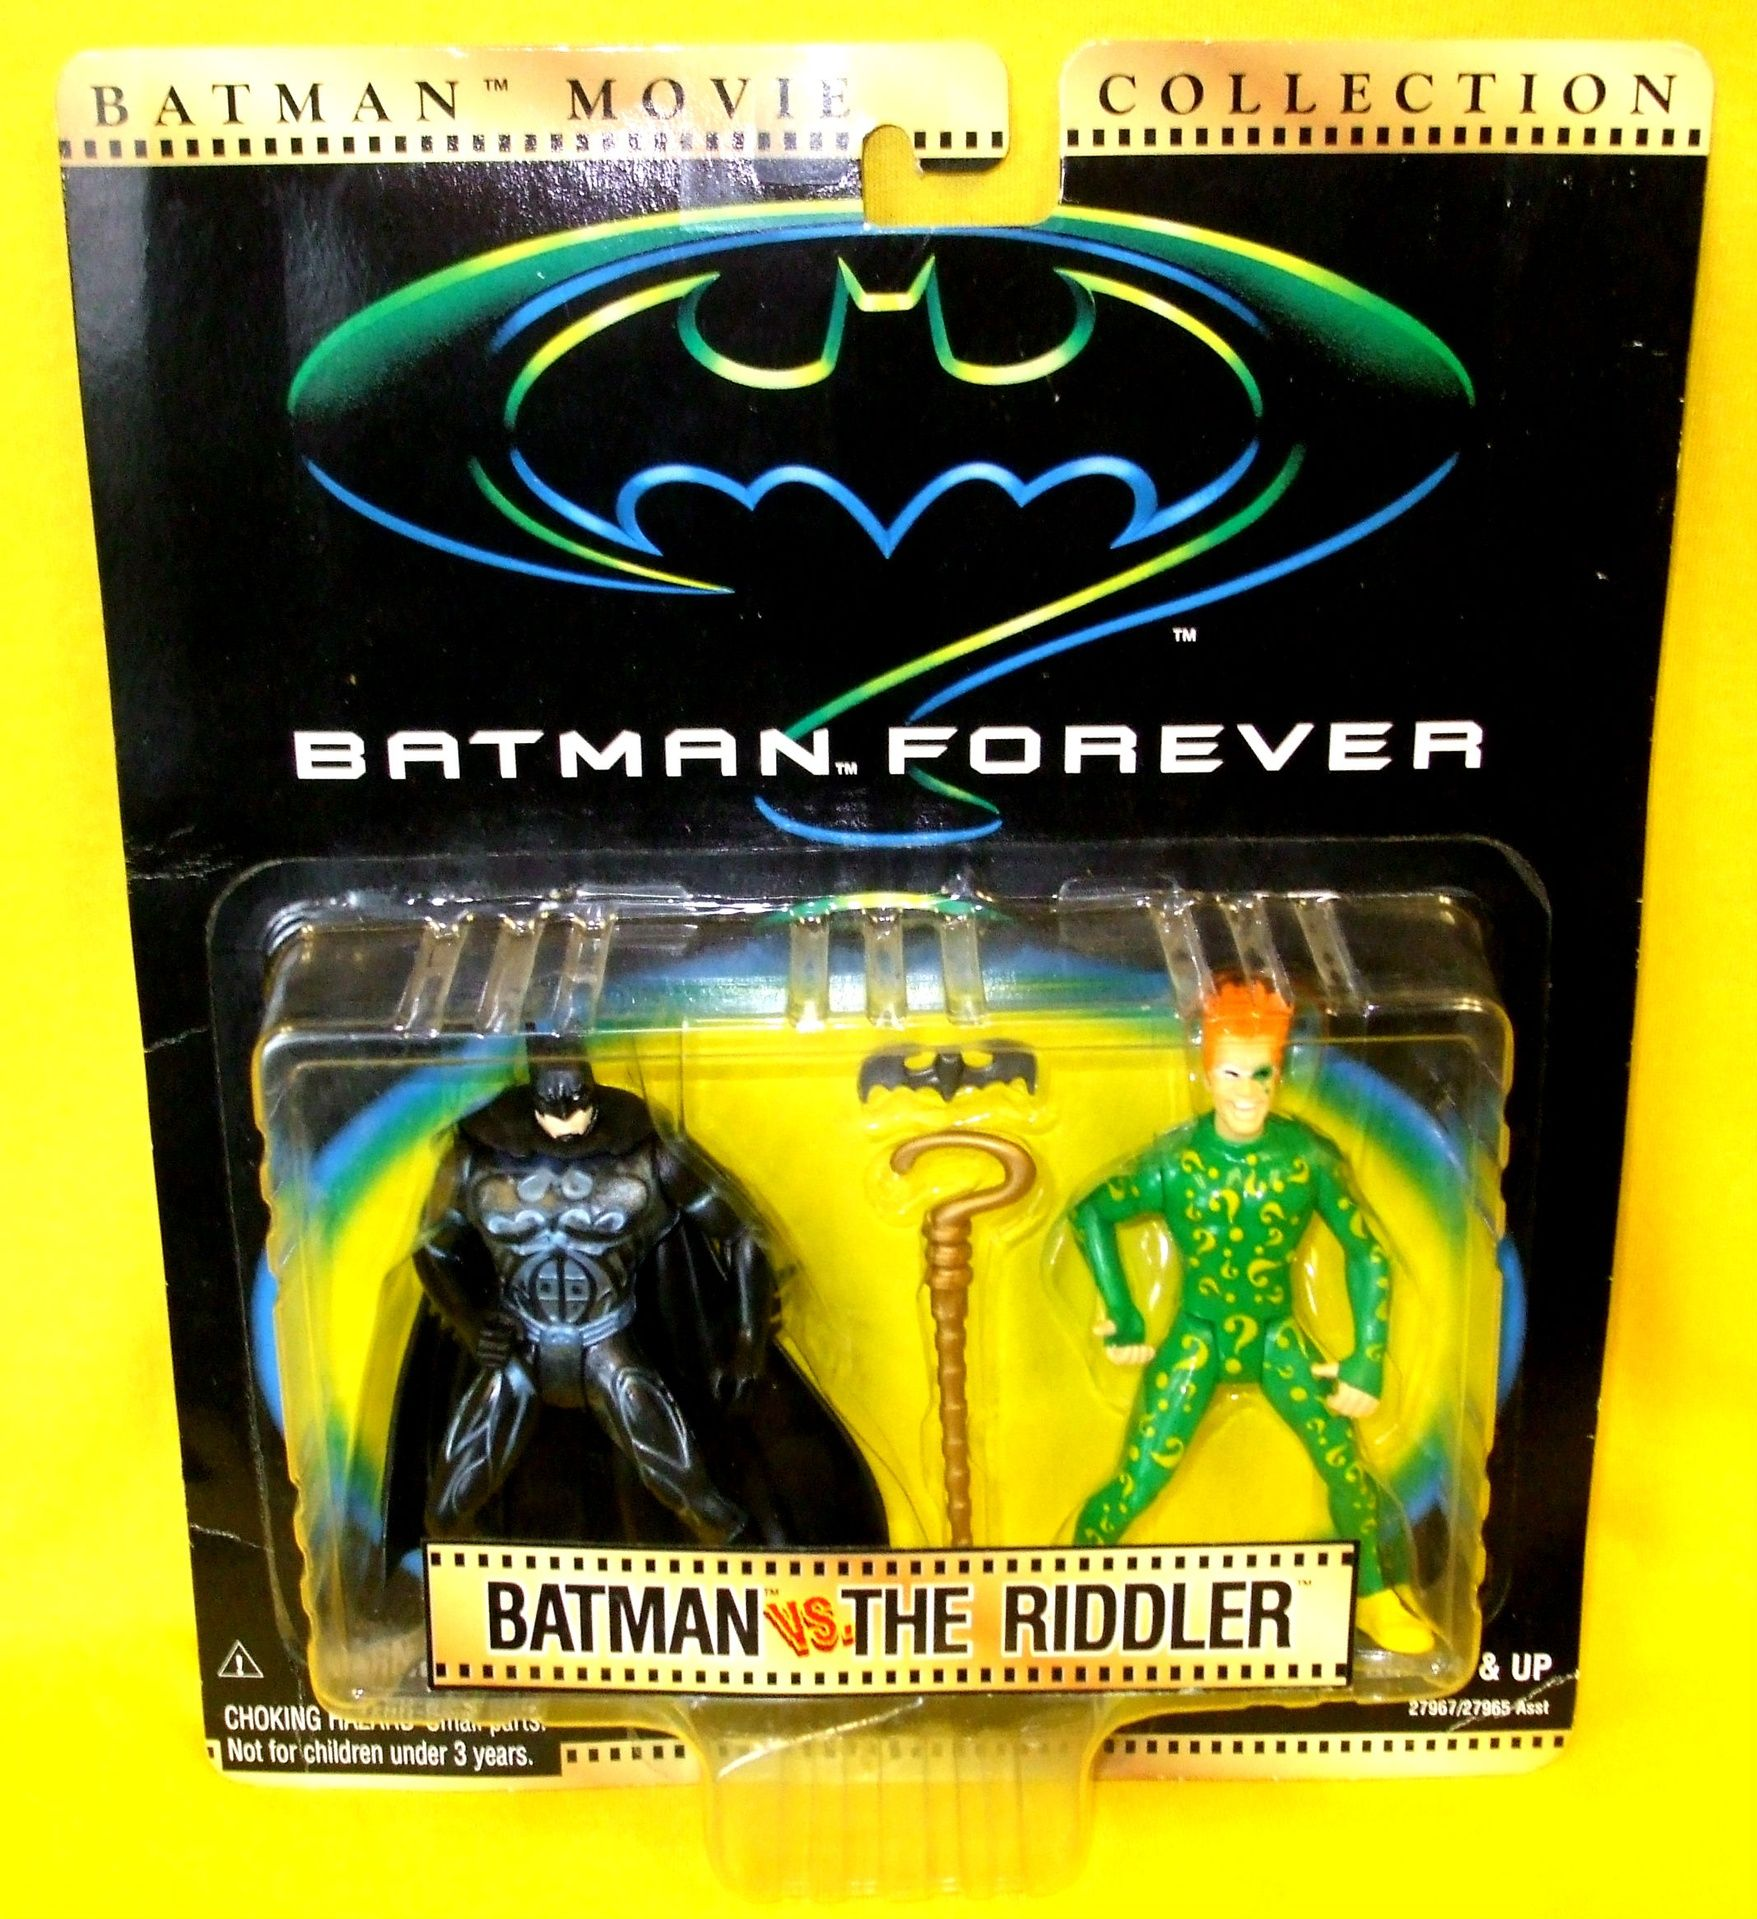 batman-movie-collection-batman-forever-batman-vs-the-riddler-2-pack-472-p.jpg